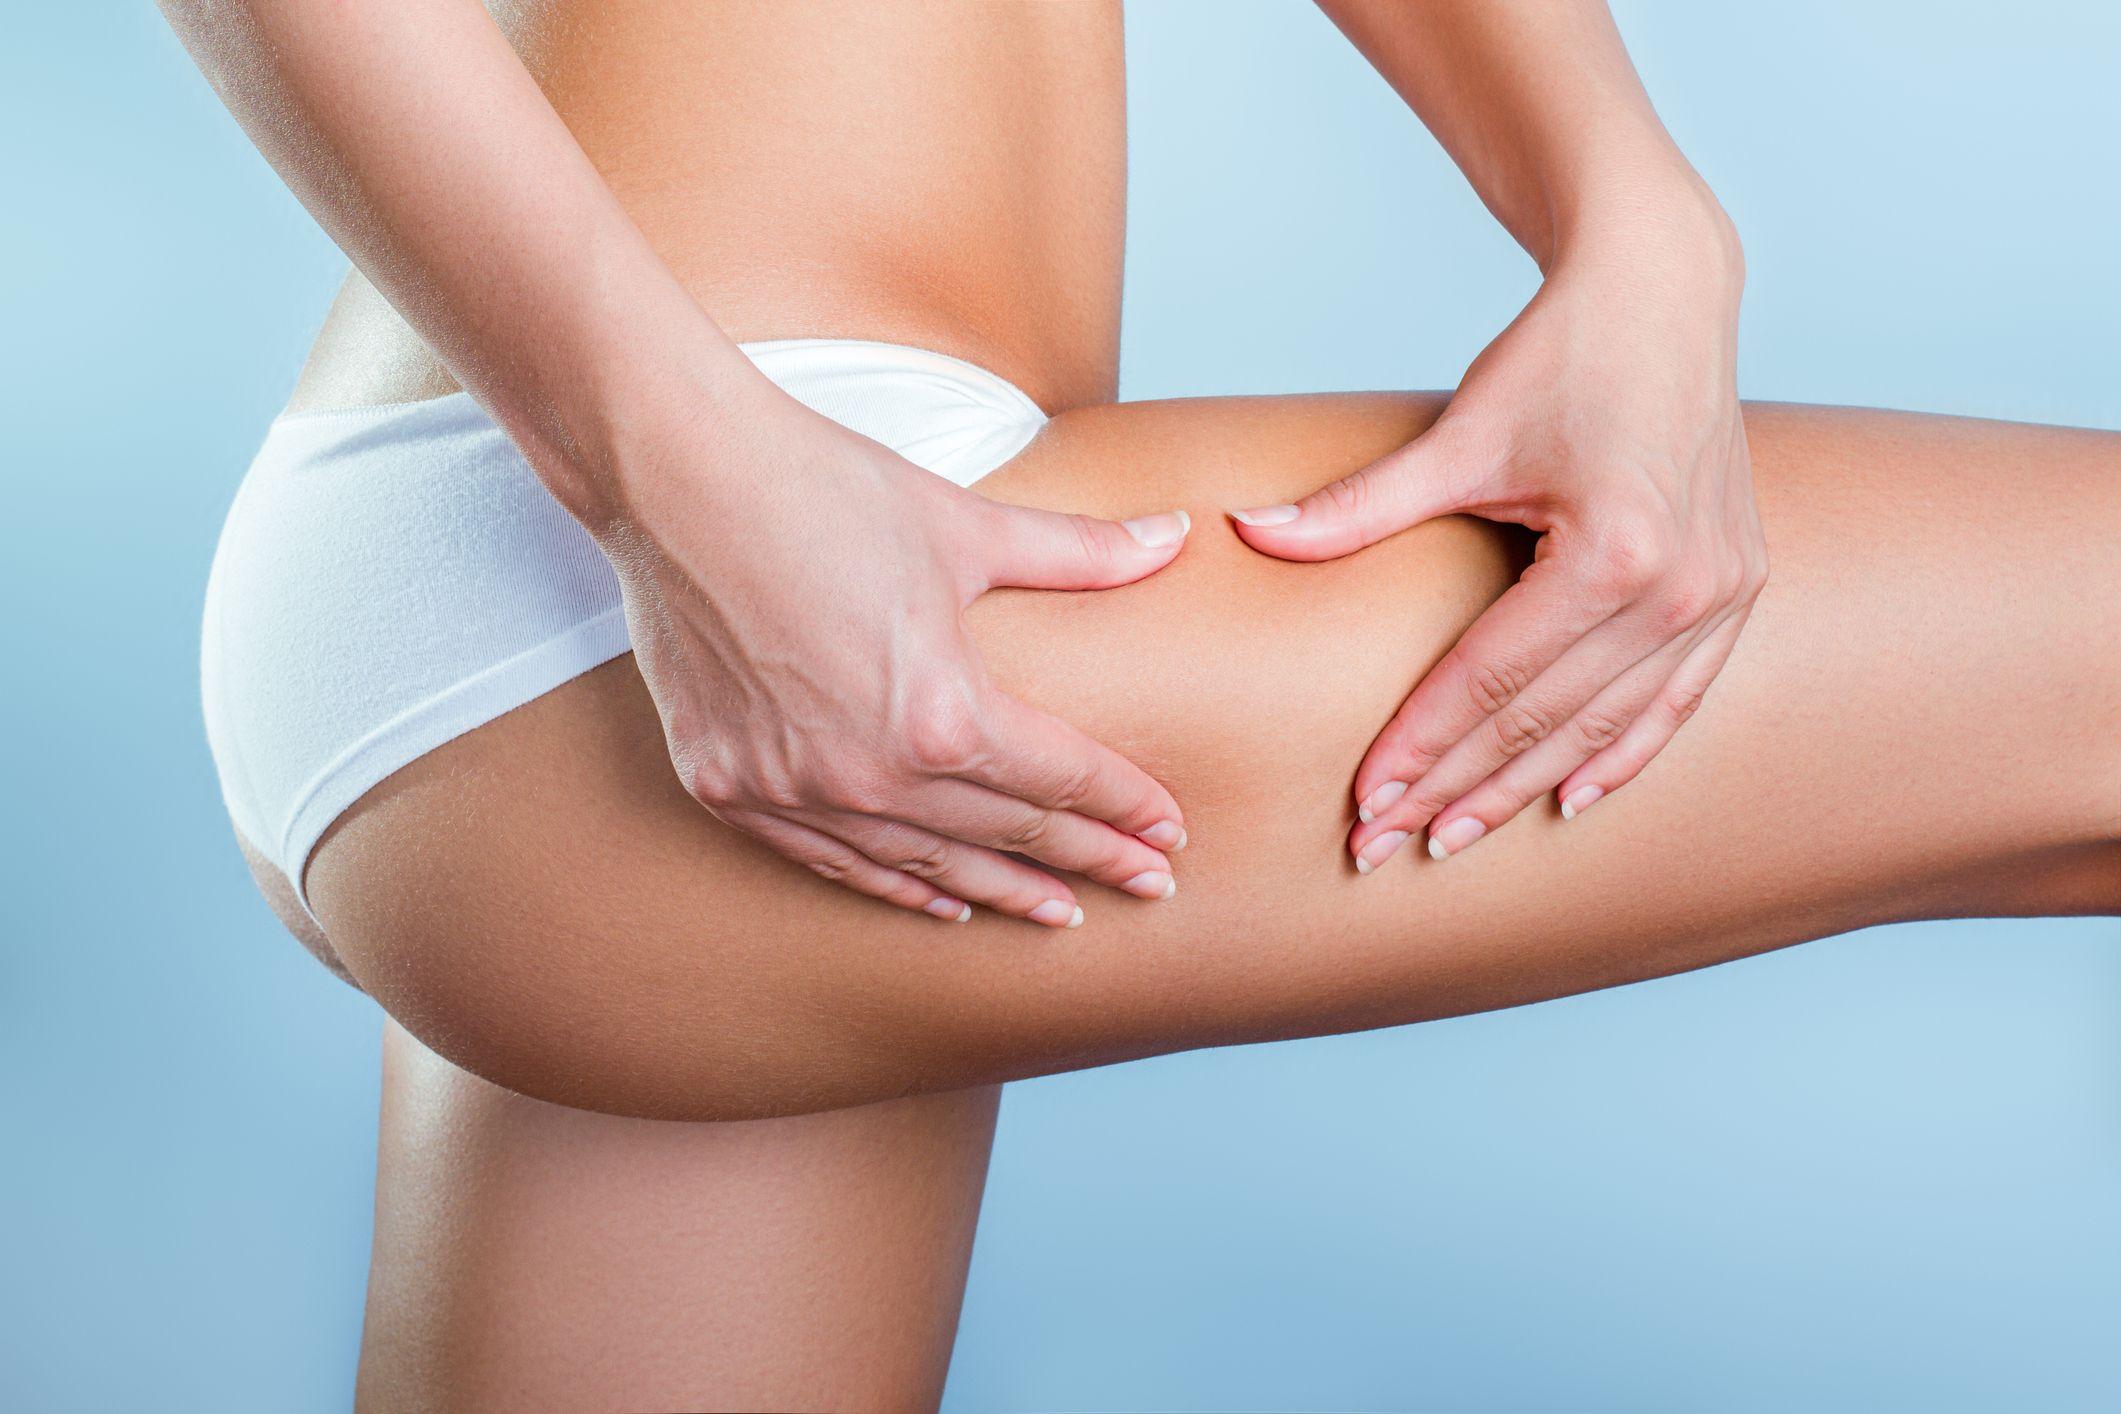 Tratamientos corporales anticelulítico-reafirmante ROLLACTION SYSTEM: Products de Nhoa Nails*